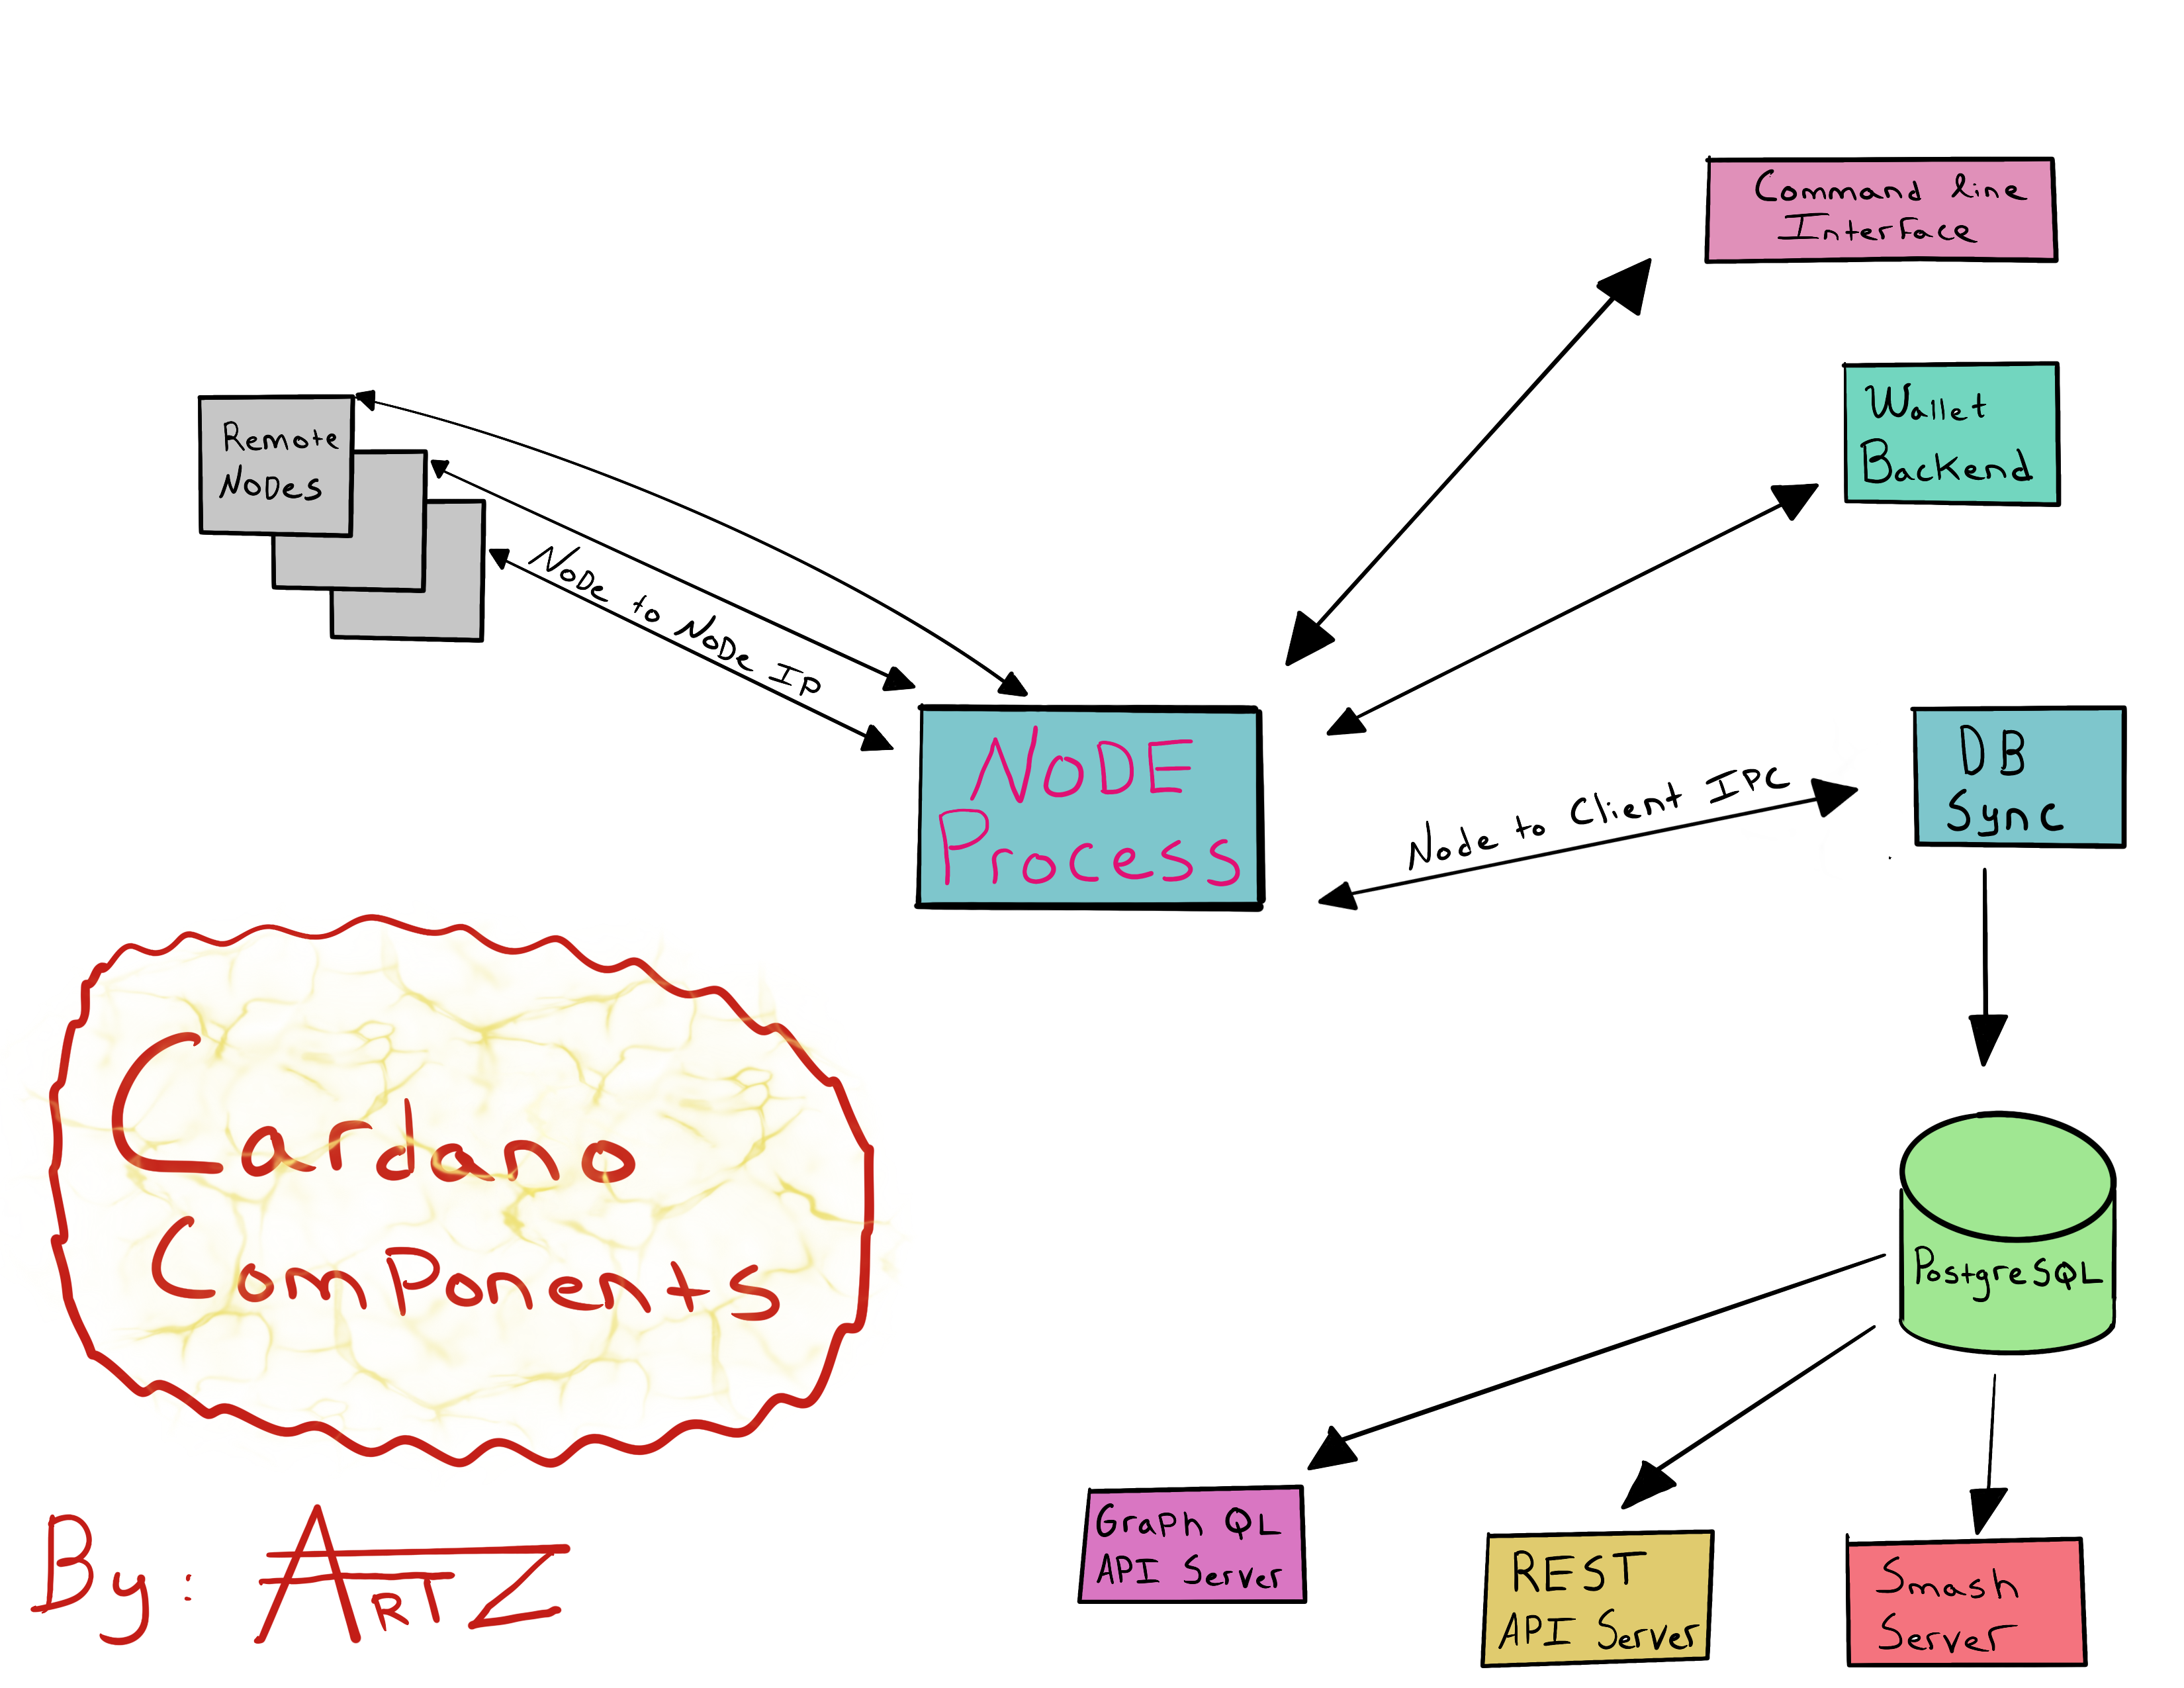 Cardano_Components